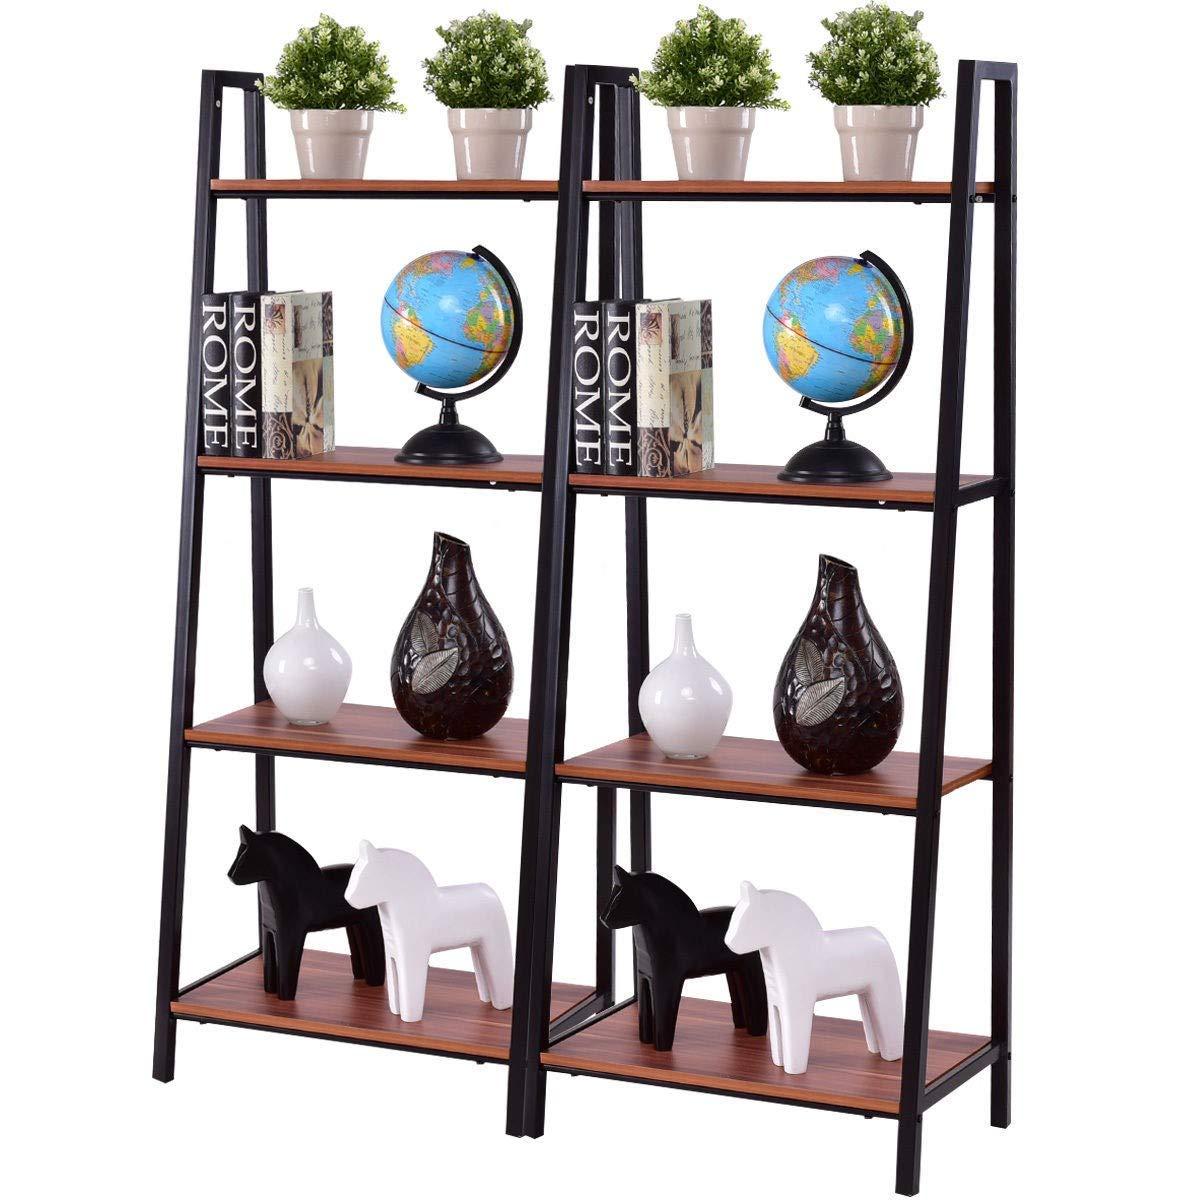 BeUniqueToday 2 pcs 4-Tier Modern Ladder Bookshelf Ladder Bookshelf Shelf Bookcase Tier Modern Storage Display